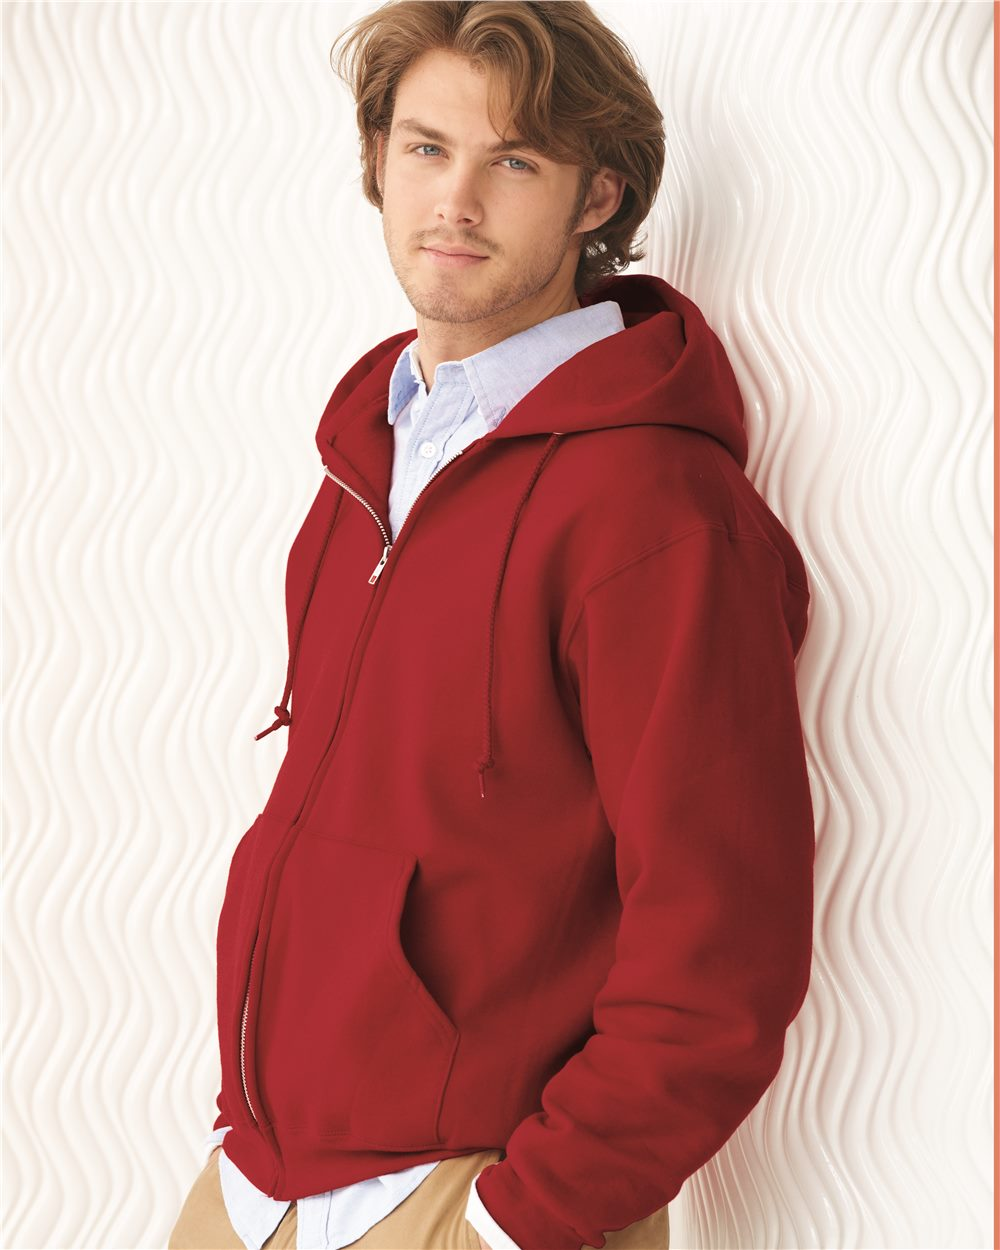 JERZEES 4999M NuBlend SUPER SWEATS Full-Zip Hooded Sweatshirt